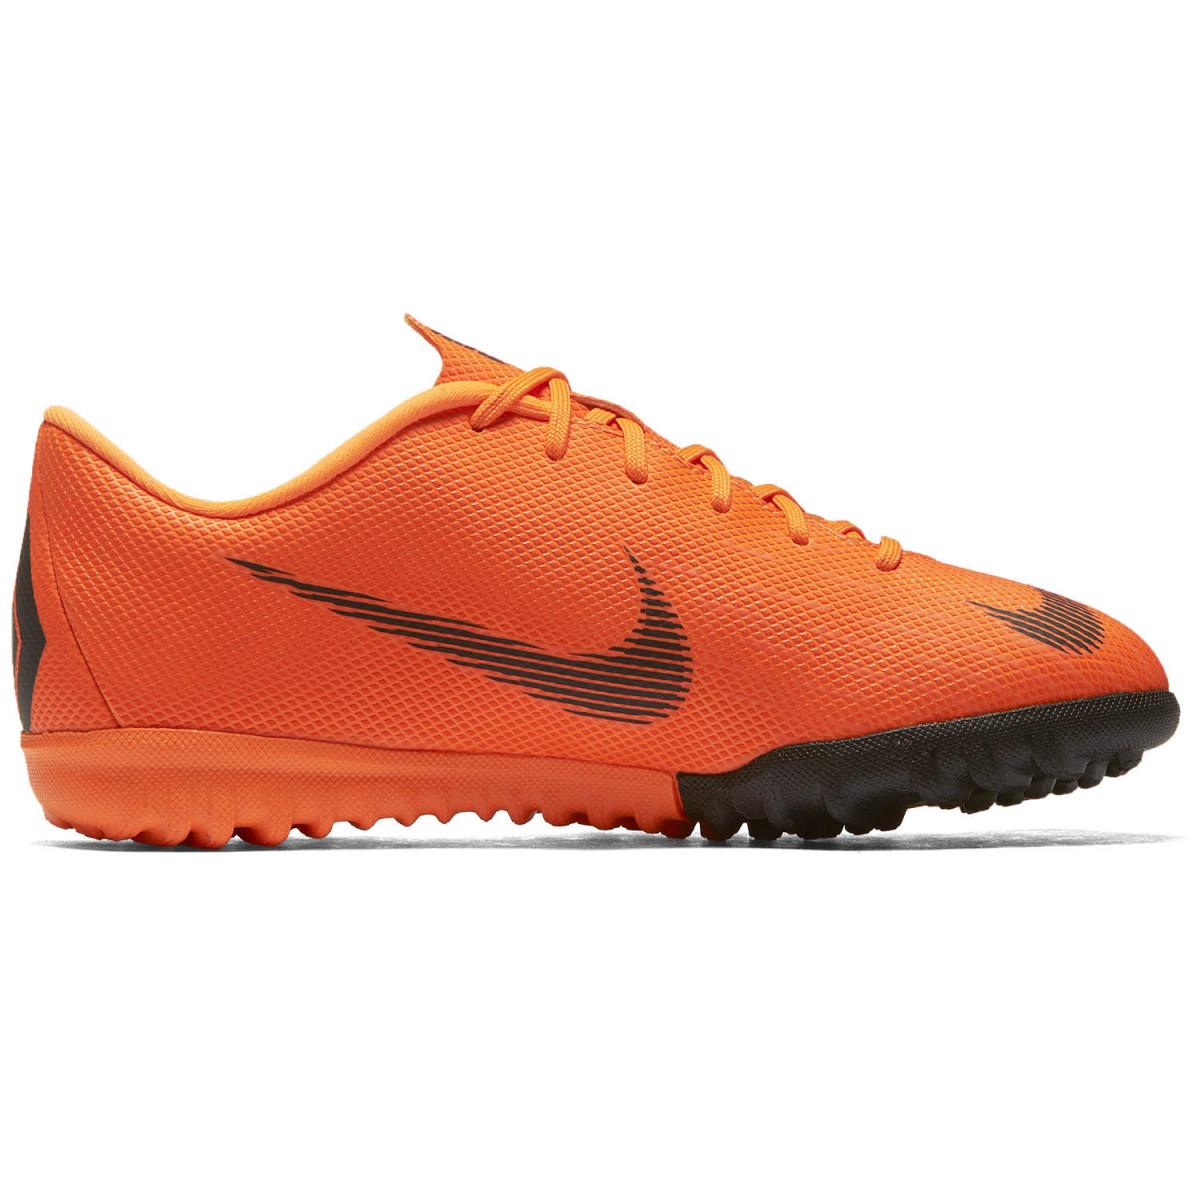 0d39be378 Botines Nike Vaporx 12 Academy Gs Tf - Césped Sintético - Botines ...